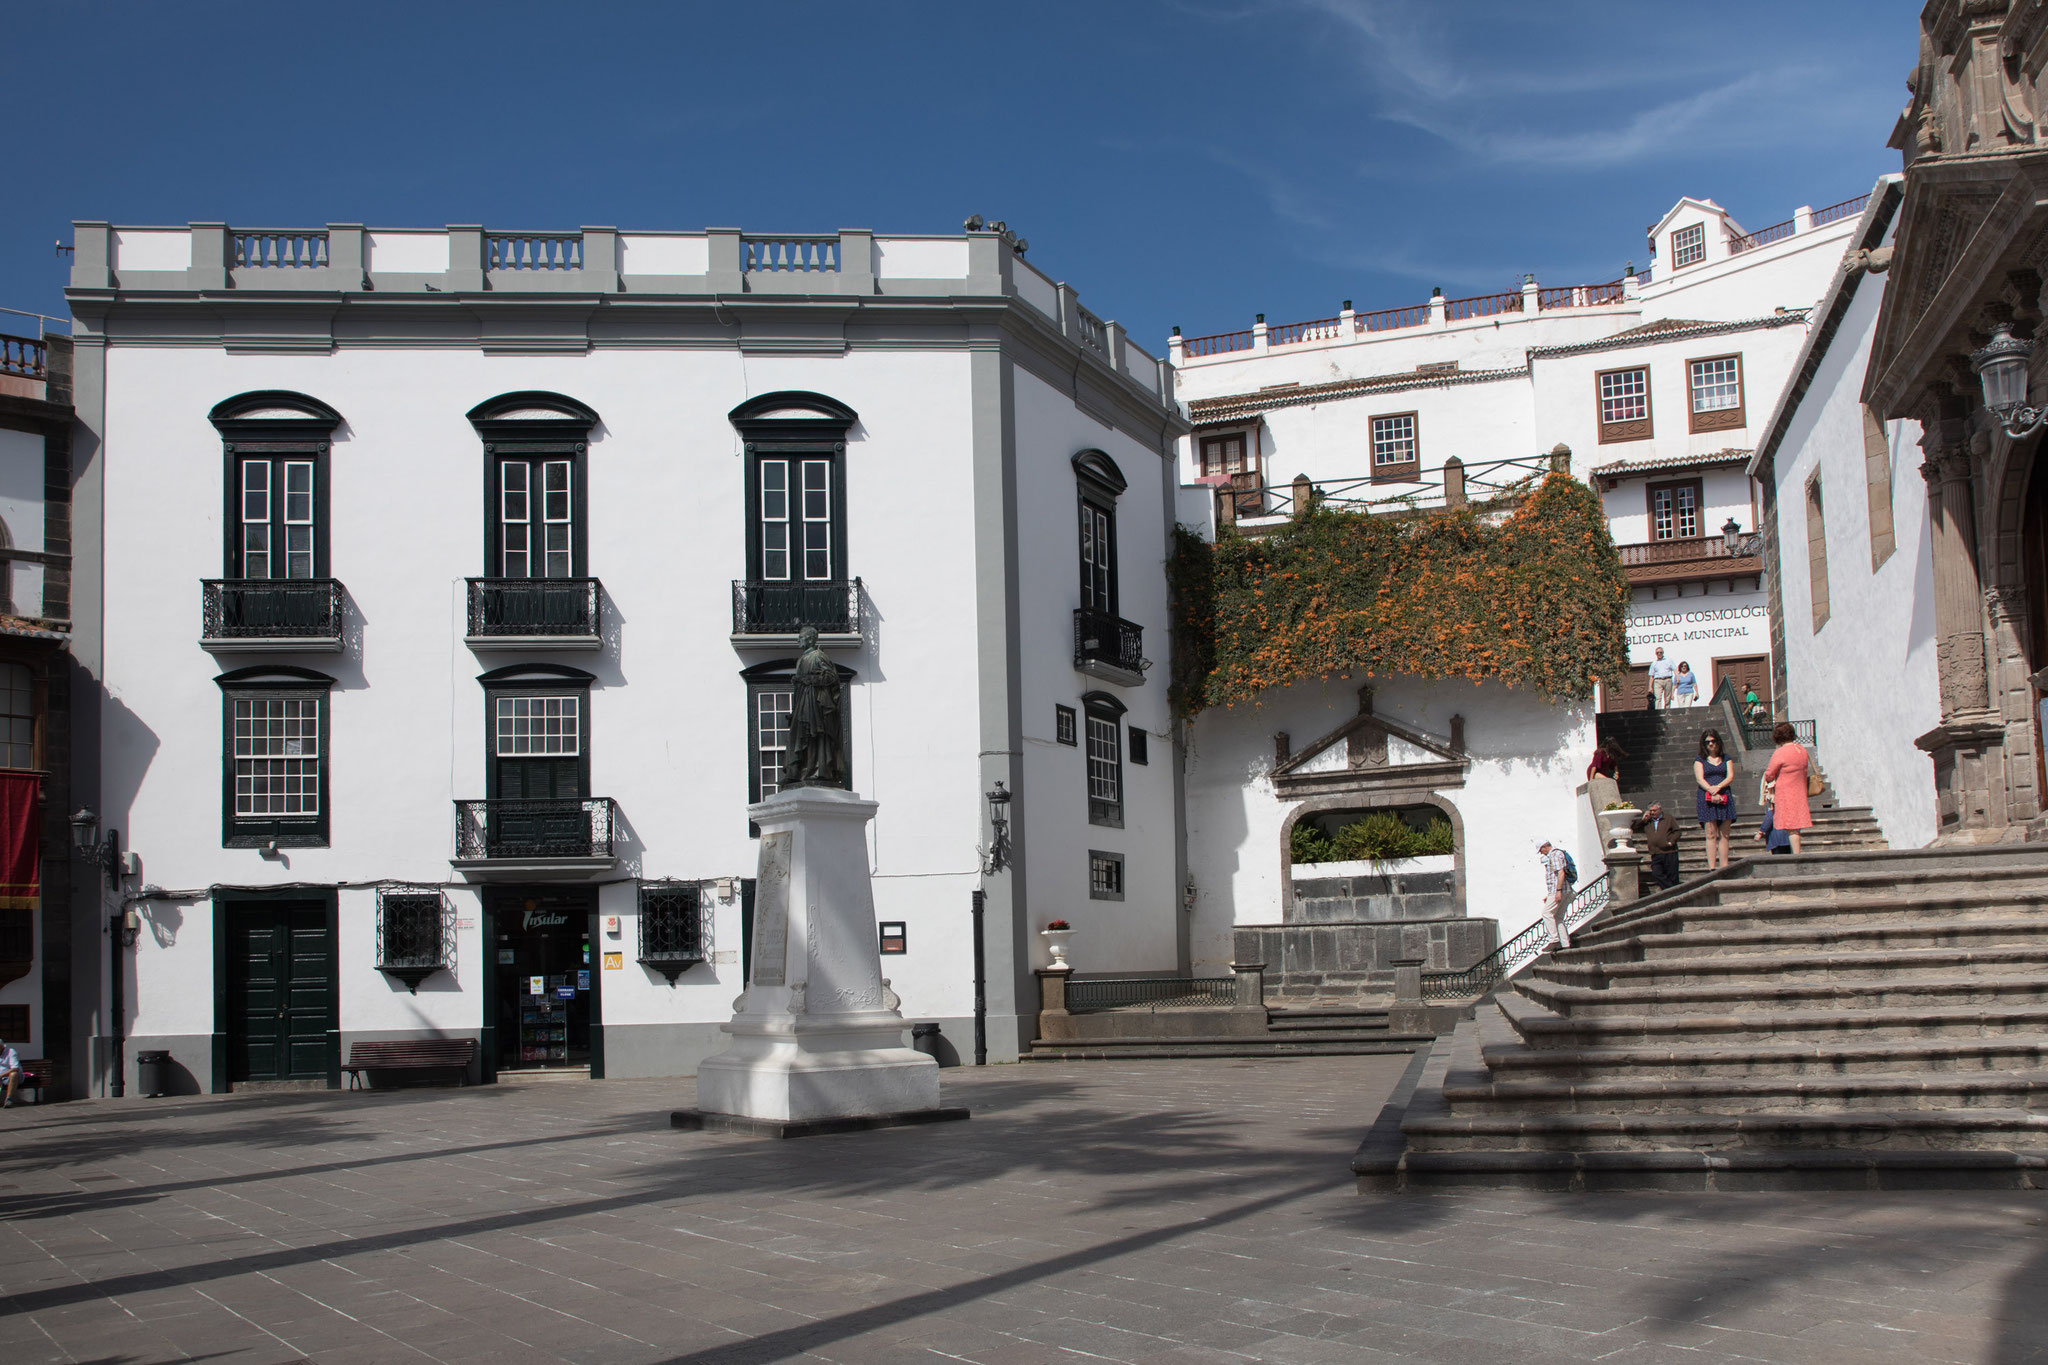 Santa Cruz de la Palma - Plaza de Espana